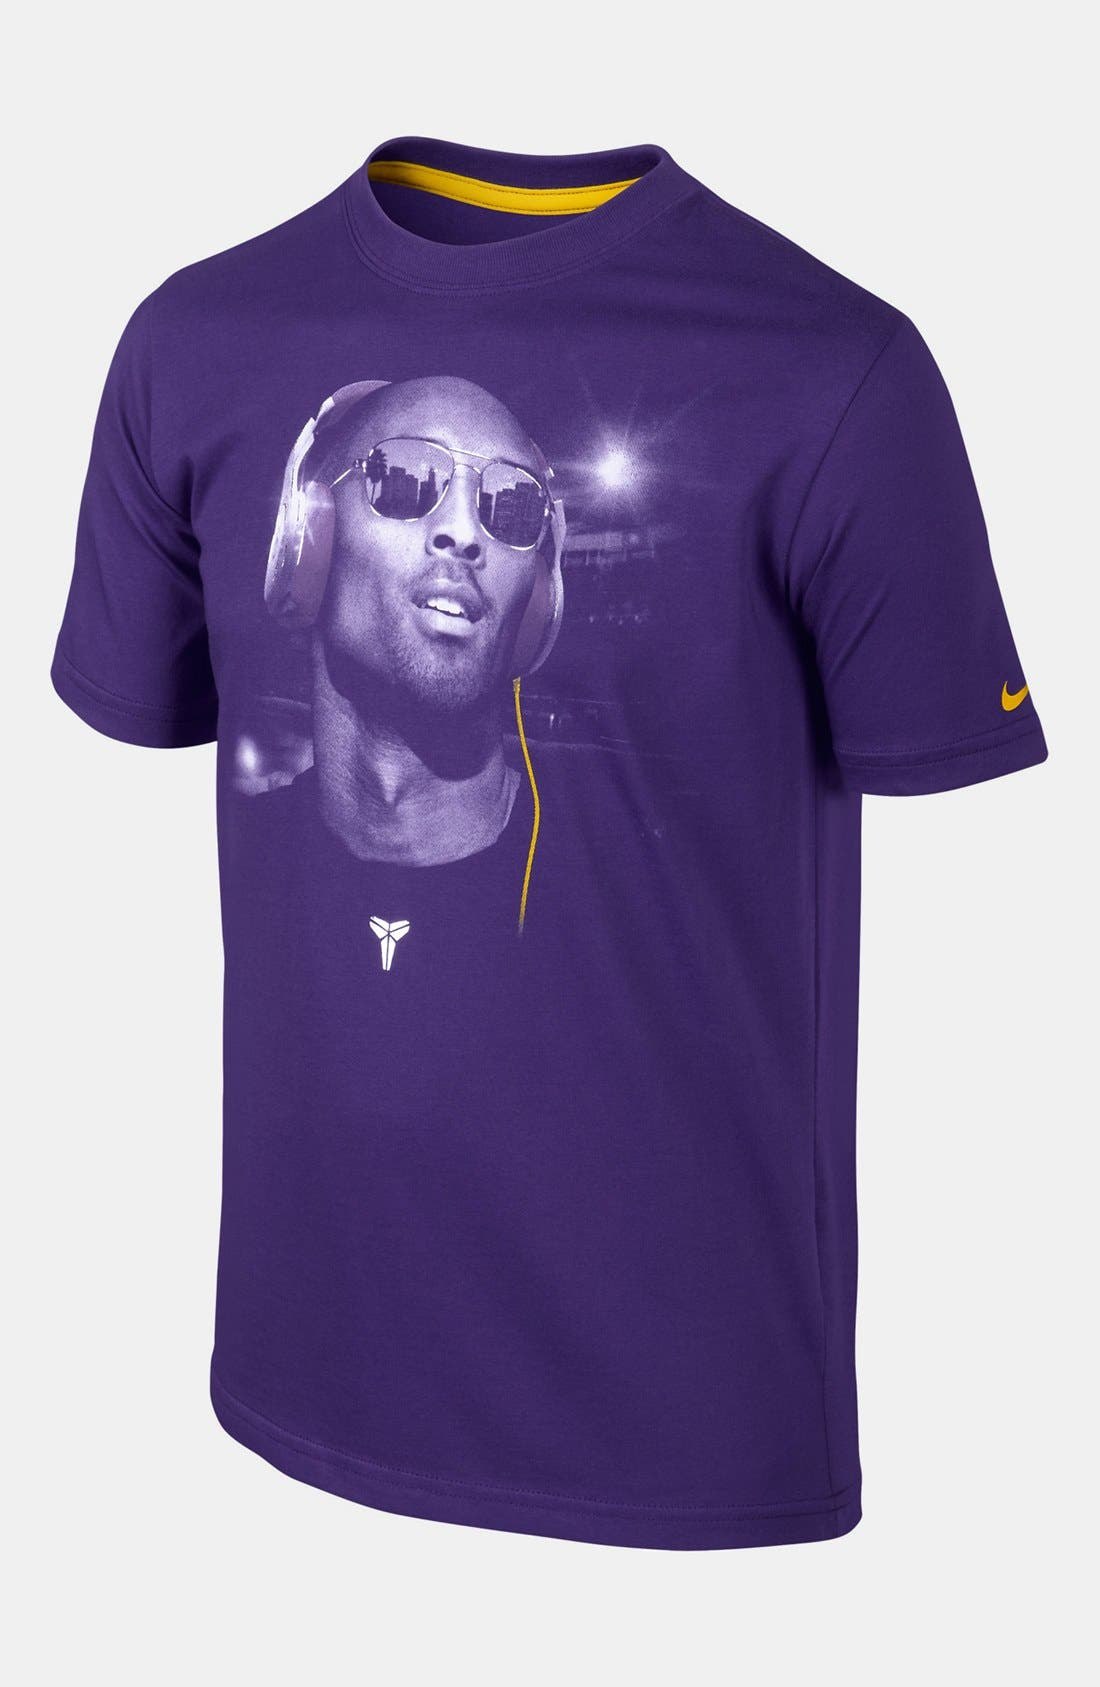 Alternate Image 1 Selected - Nike 'Kobe - Beats' T-Shirt (Big Boys)